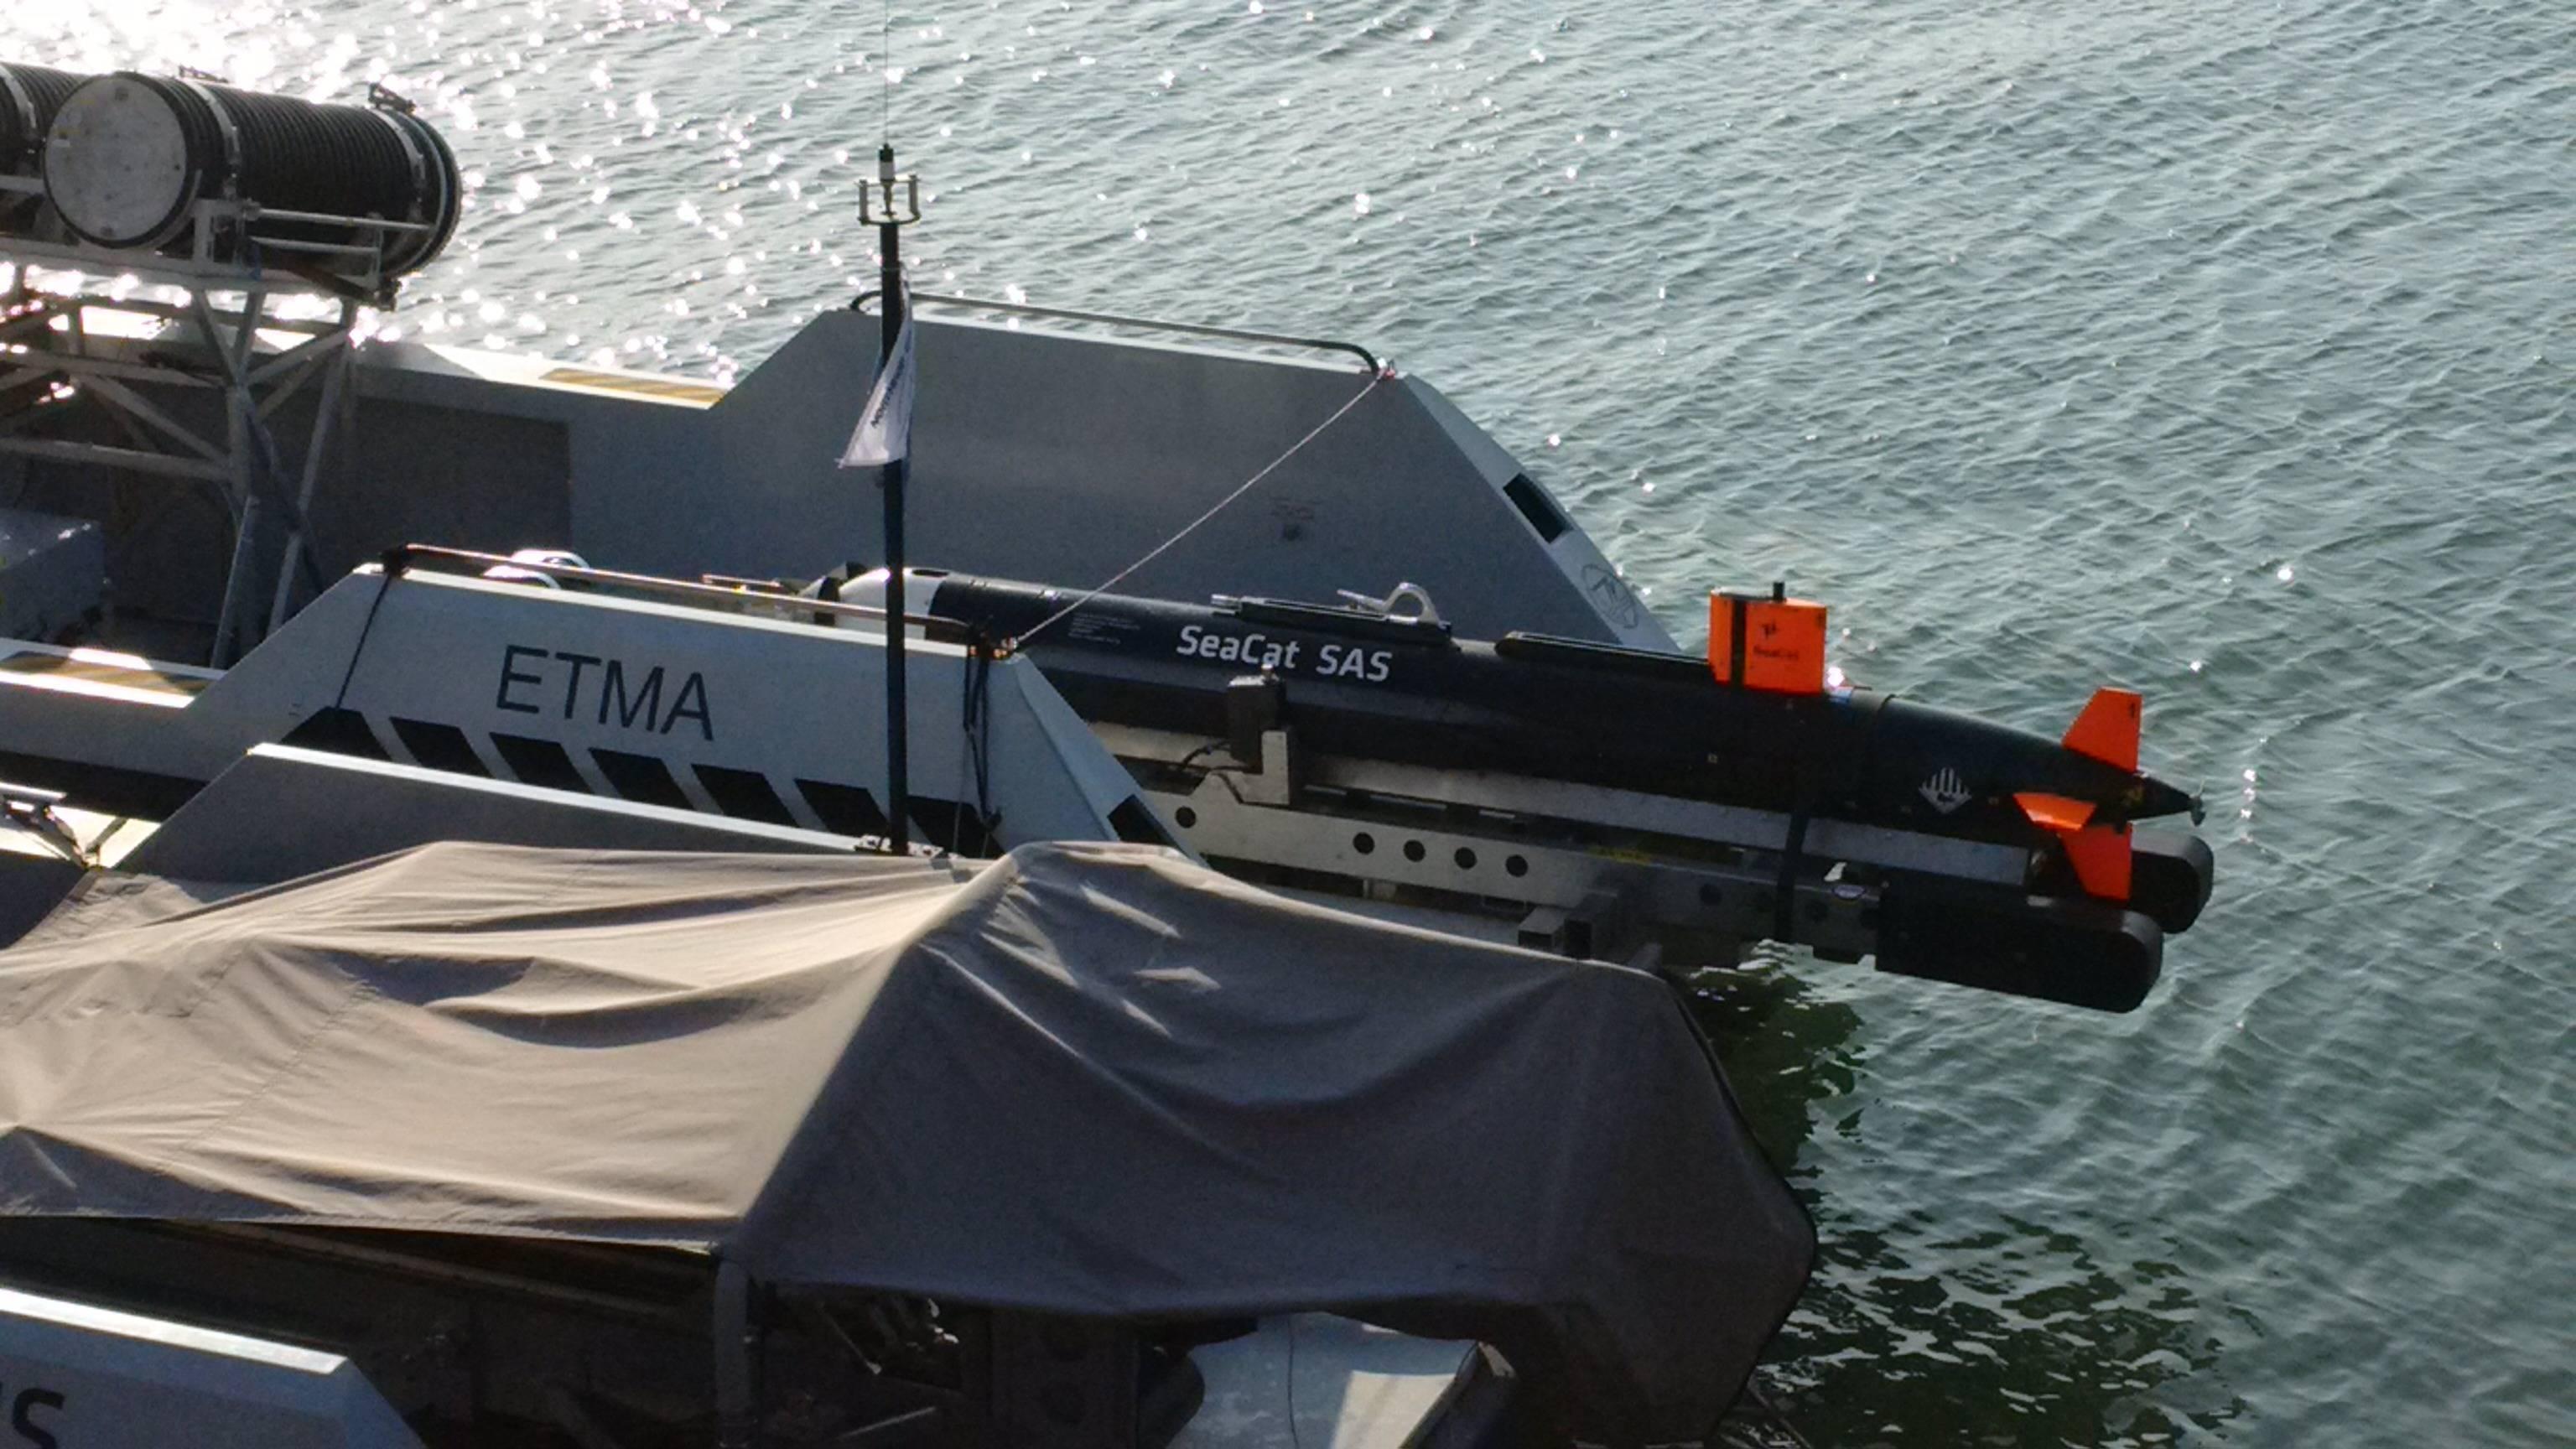 Aquapix MINSAS Integrated Onboard ATLAS Seacat AUV